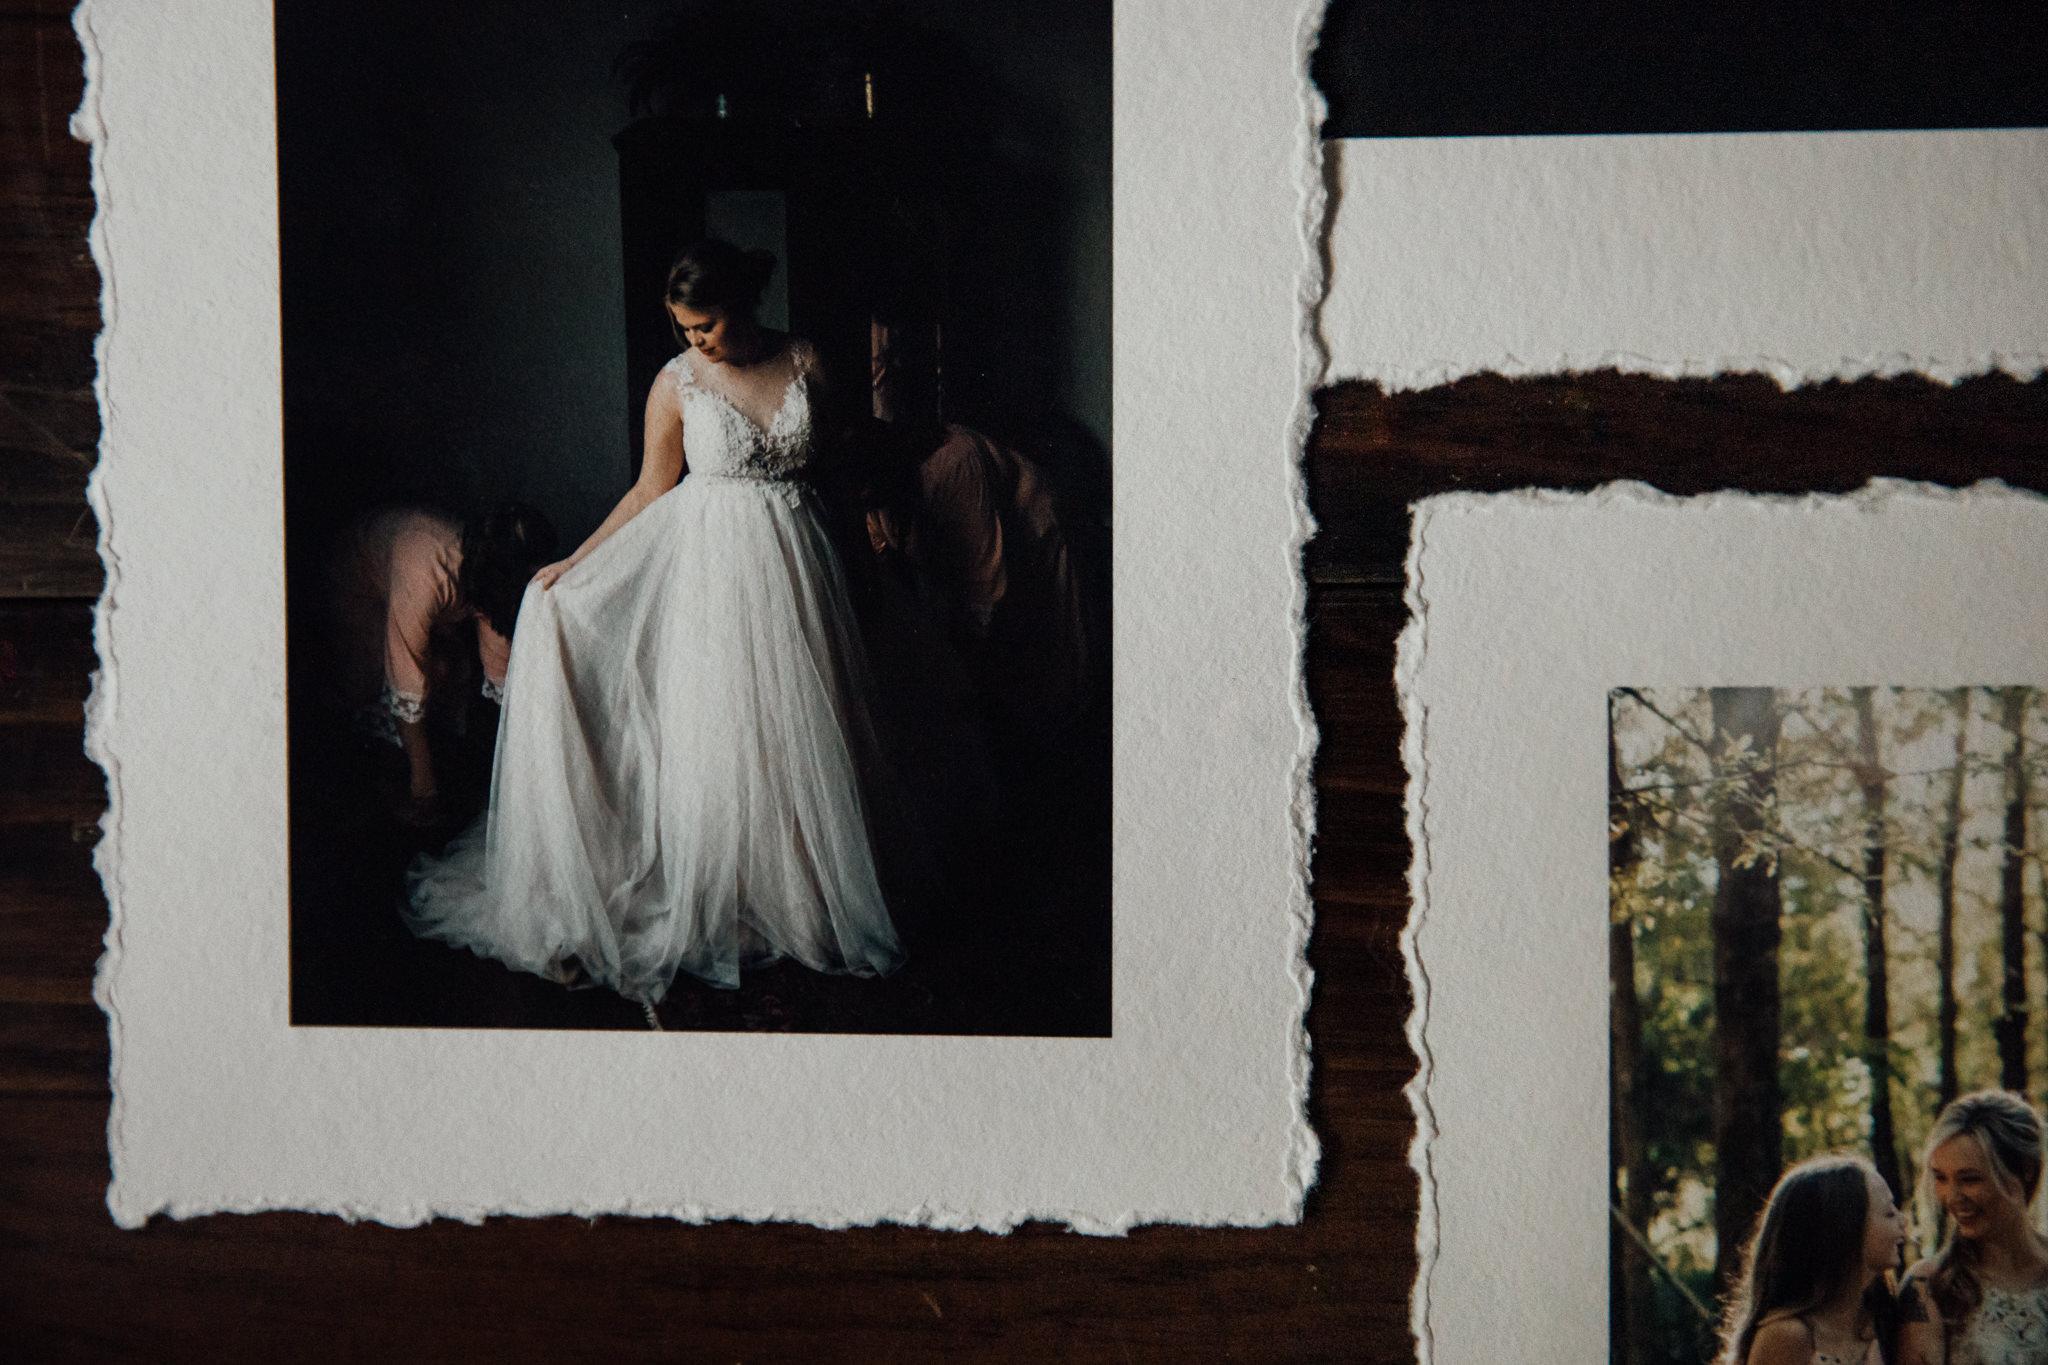 memphis-wedding-photographer-thewarmtharoundyou-2.jpg